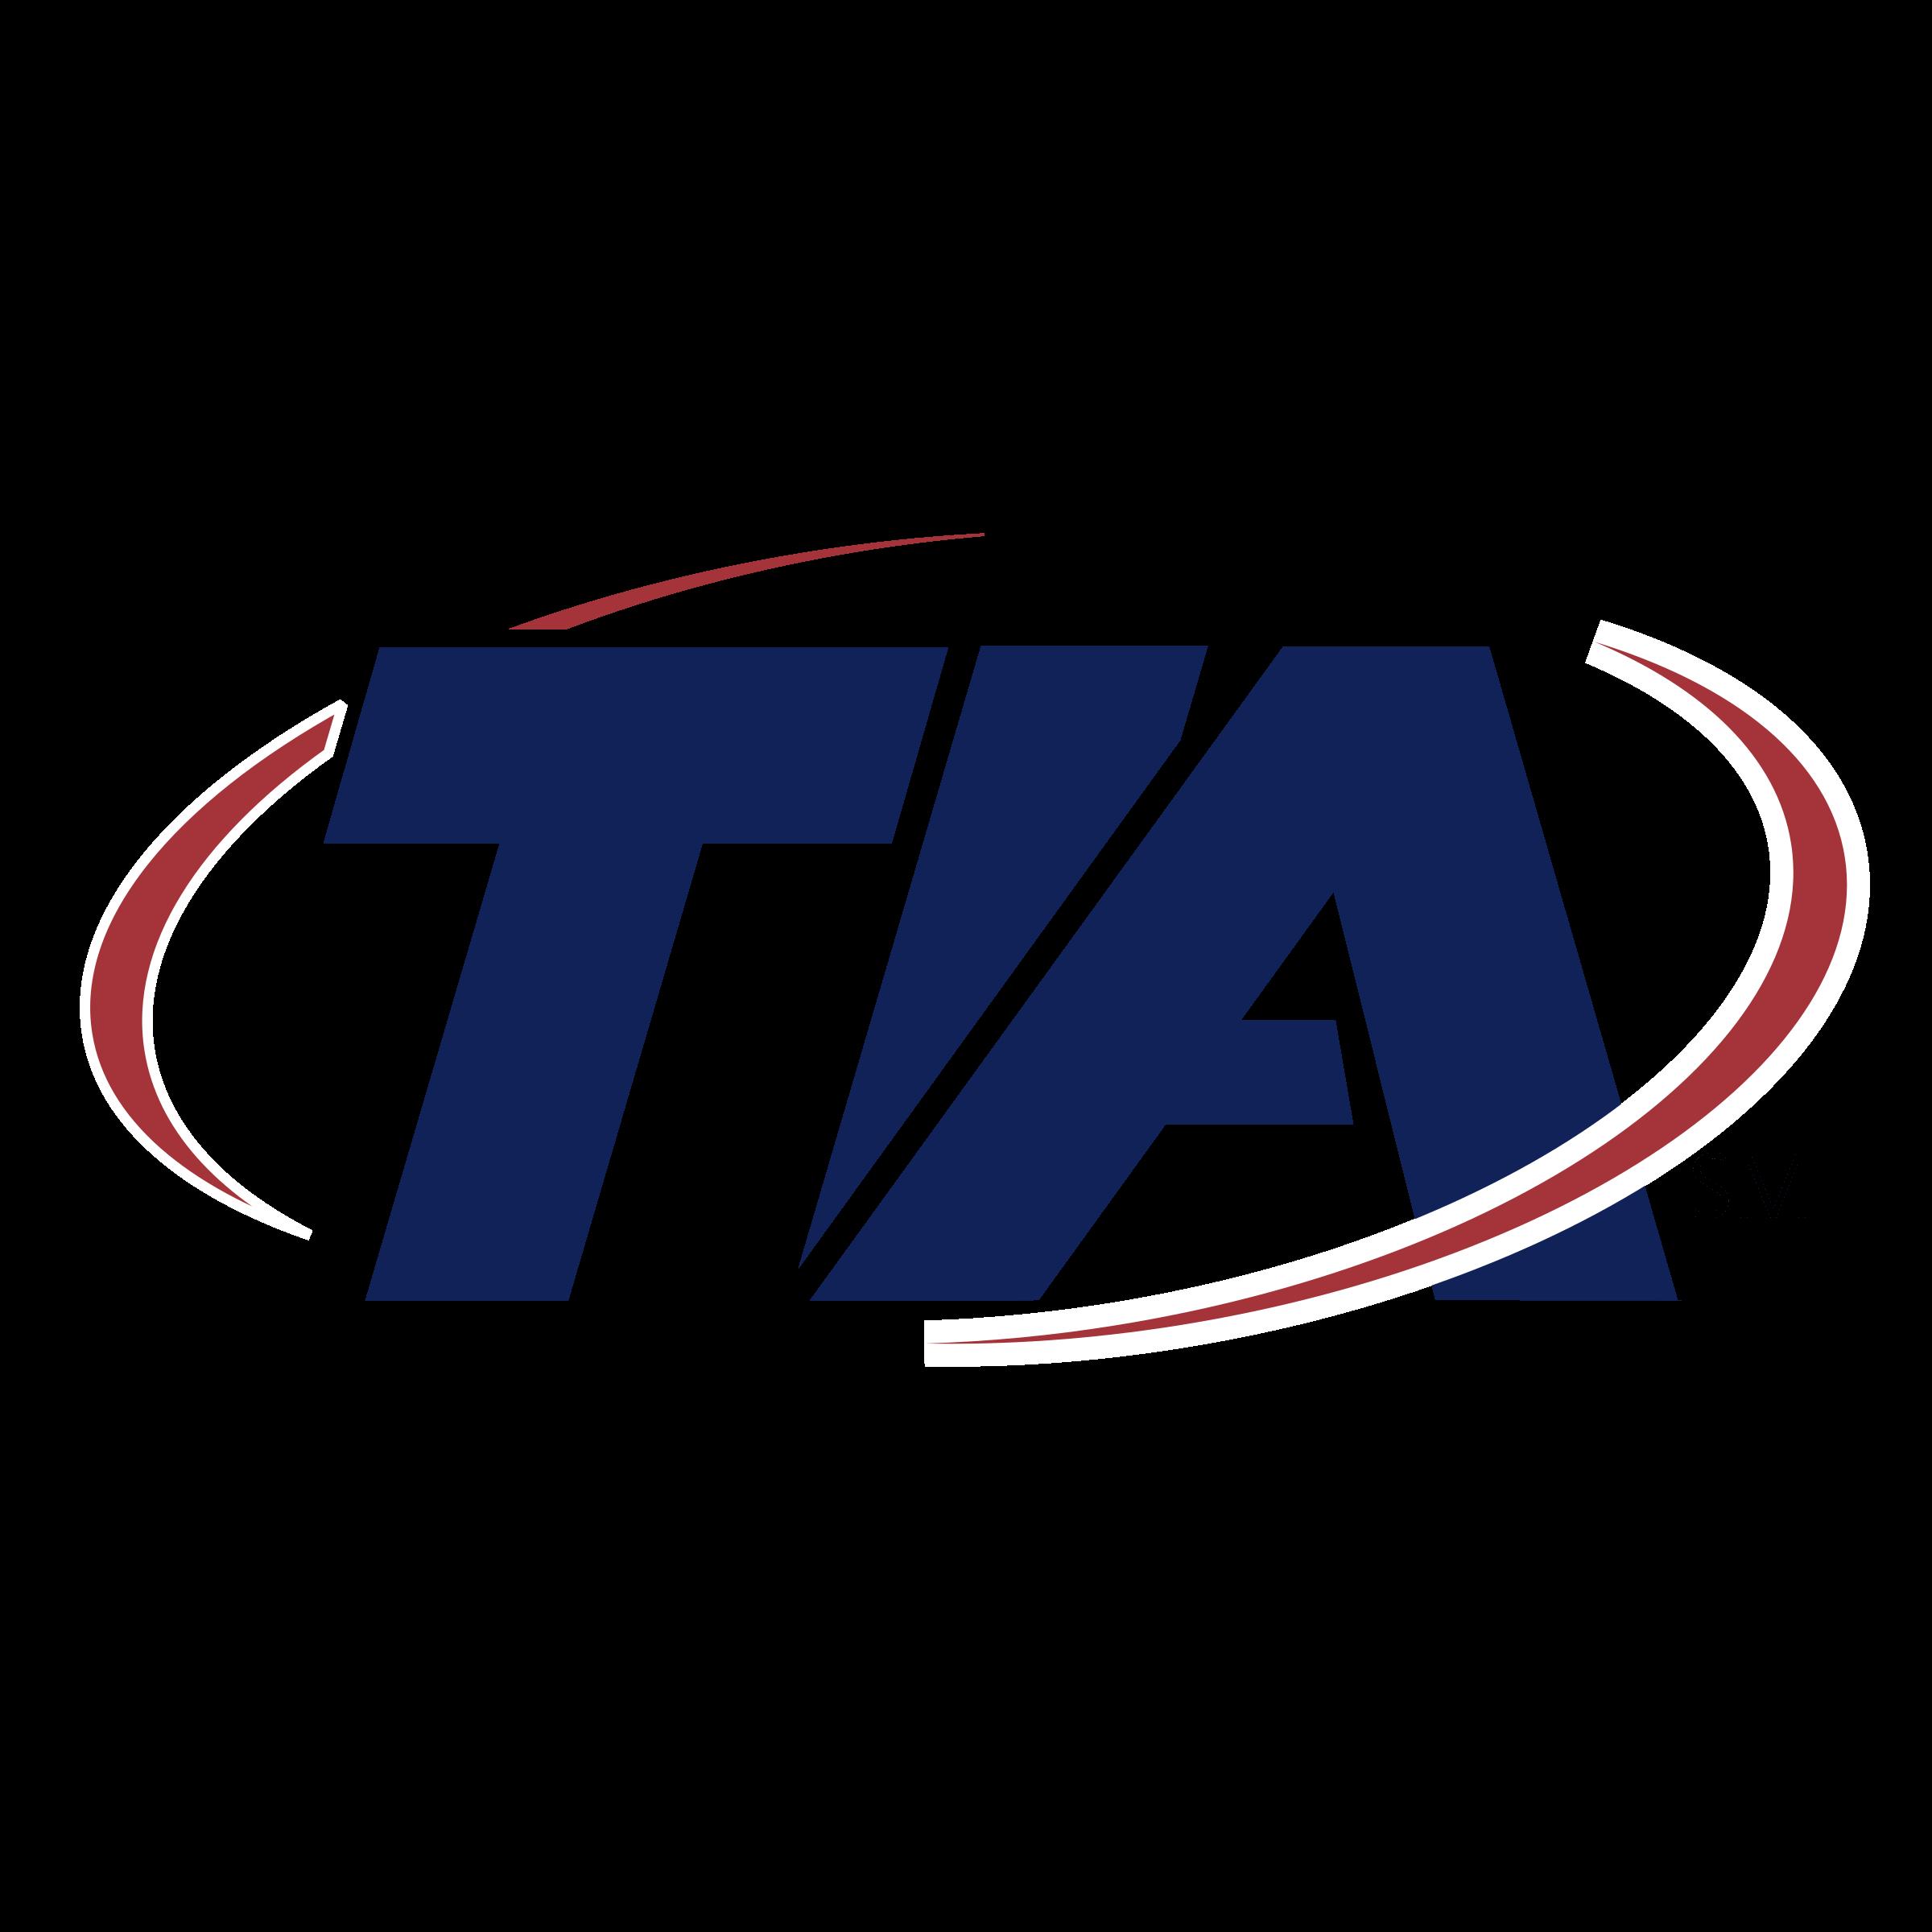 Telecommunications Industry Association - Business Performance Community